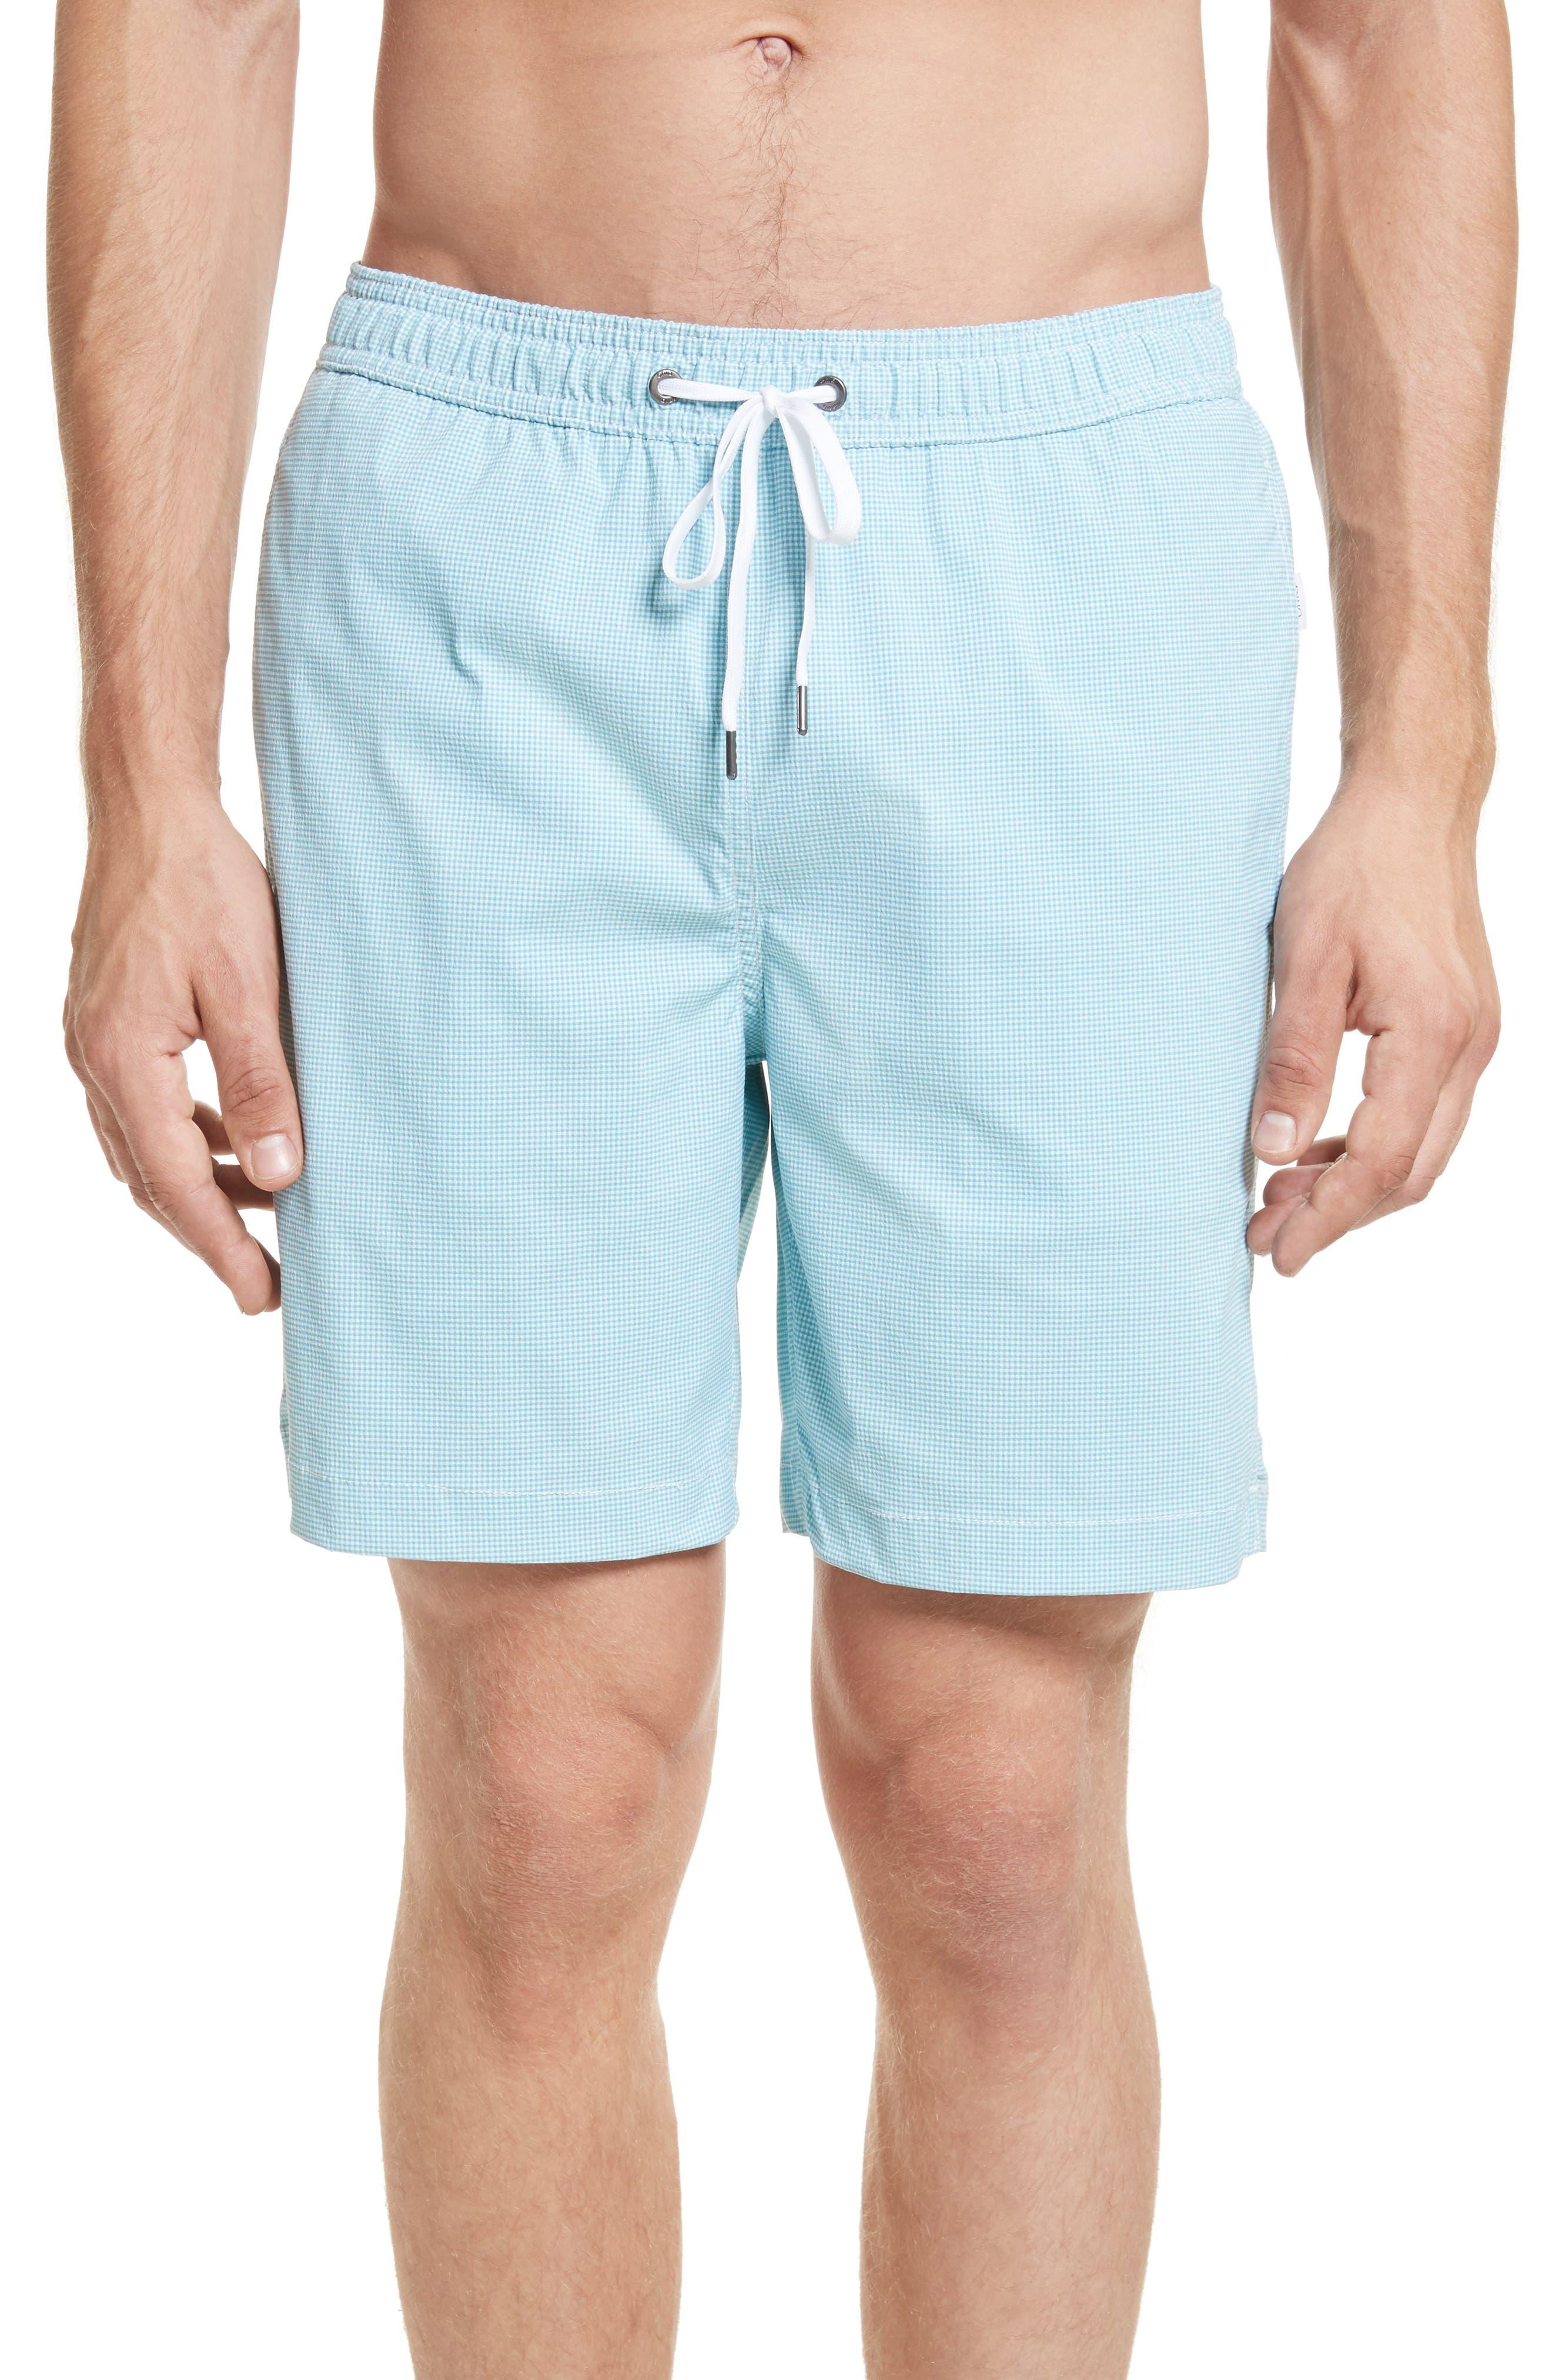 Charles Yarn Dyed Swim Trunks,                         Main,                         color, 463